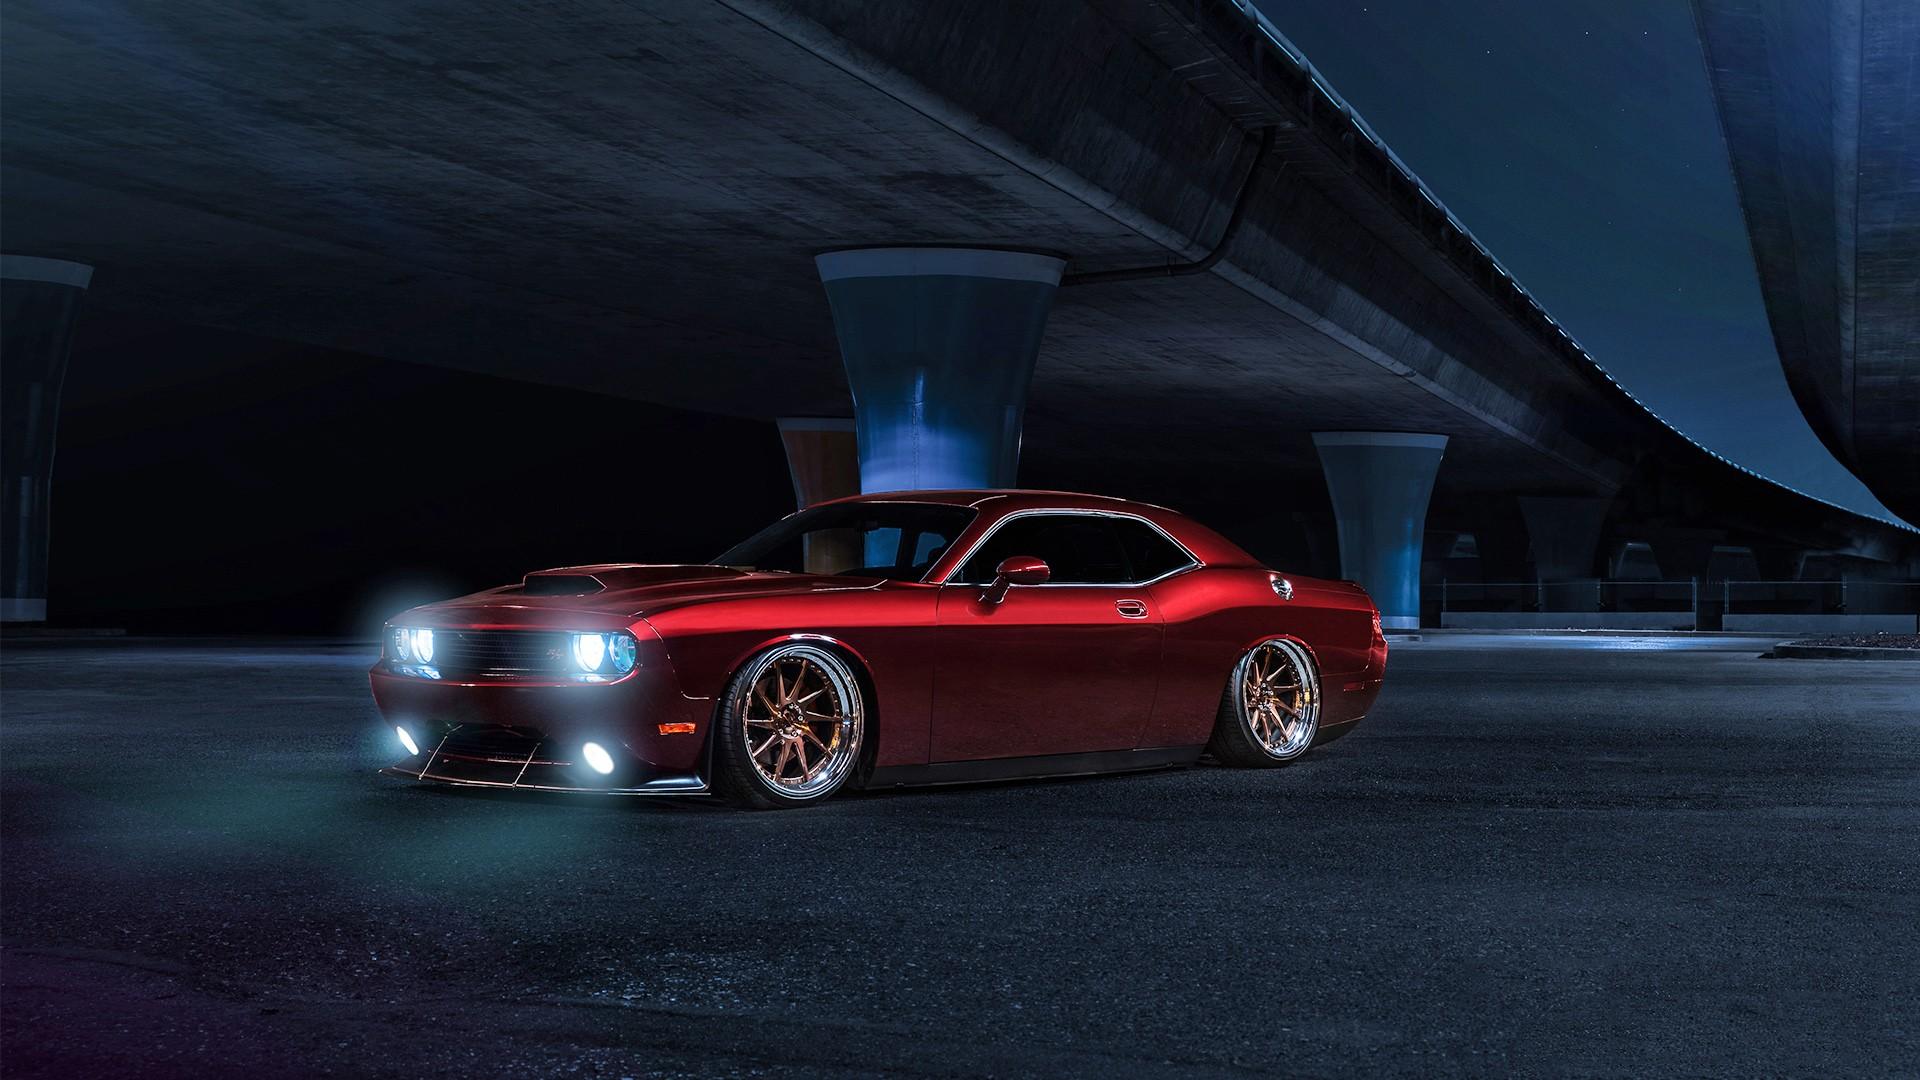 Dodge Charger Accessories >> Dodge Challenger Avant Garde Wallpaper | HD Car Wallpapers ...